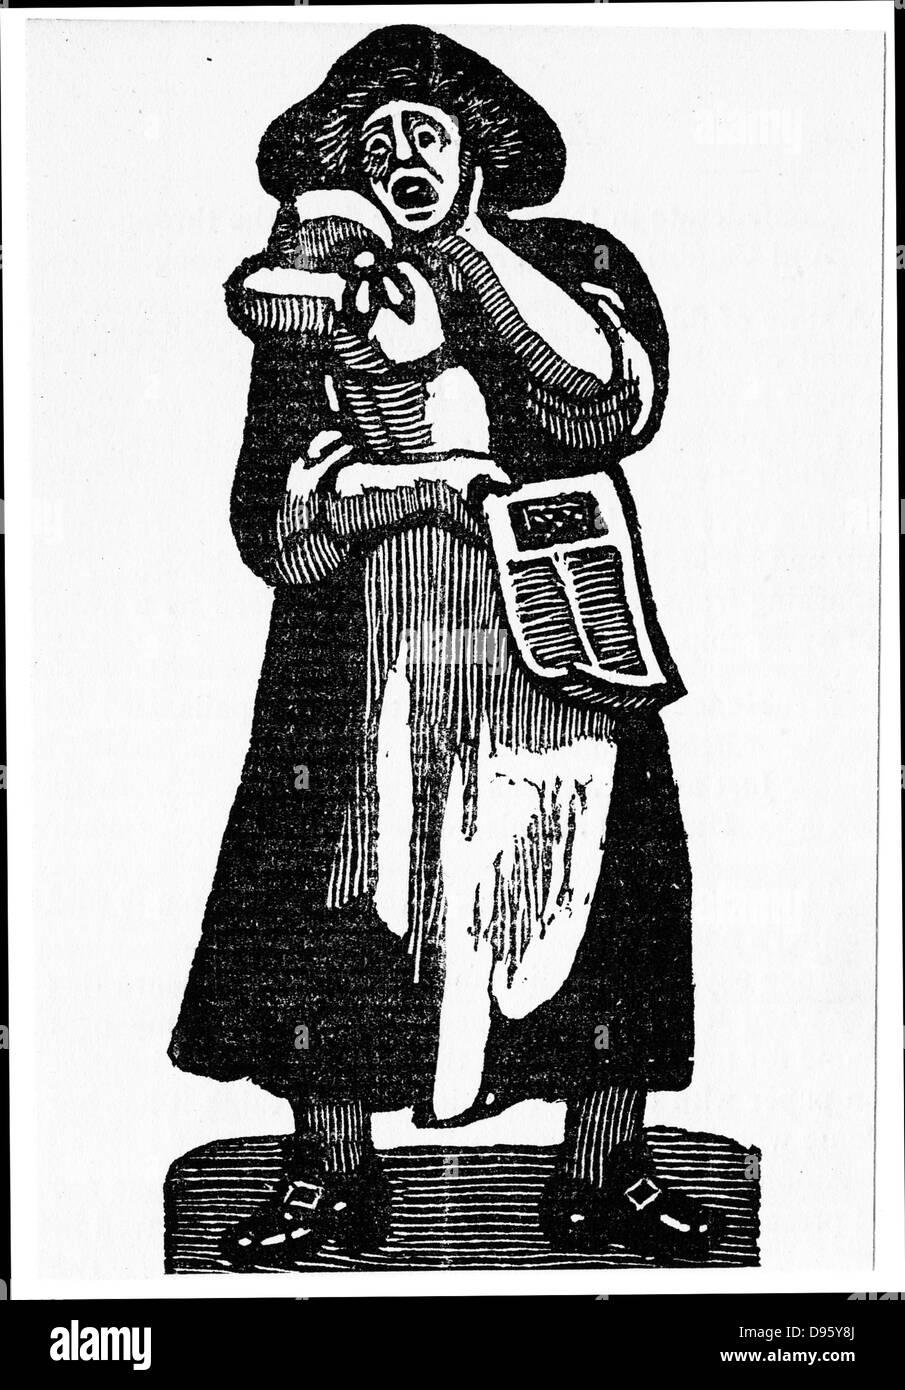 Peddler femmina stampati di vendita di ballate di strada. Xvii secolo Londra. Immagini Stock